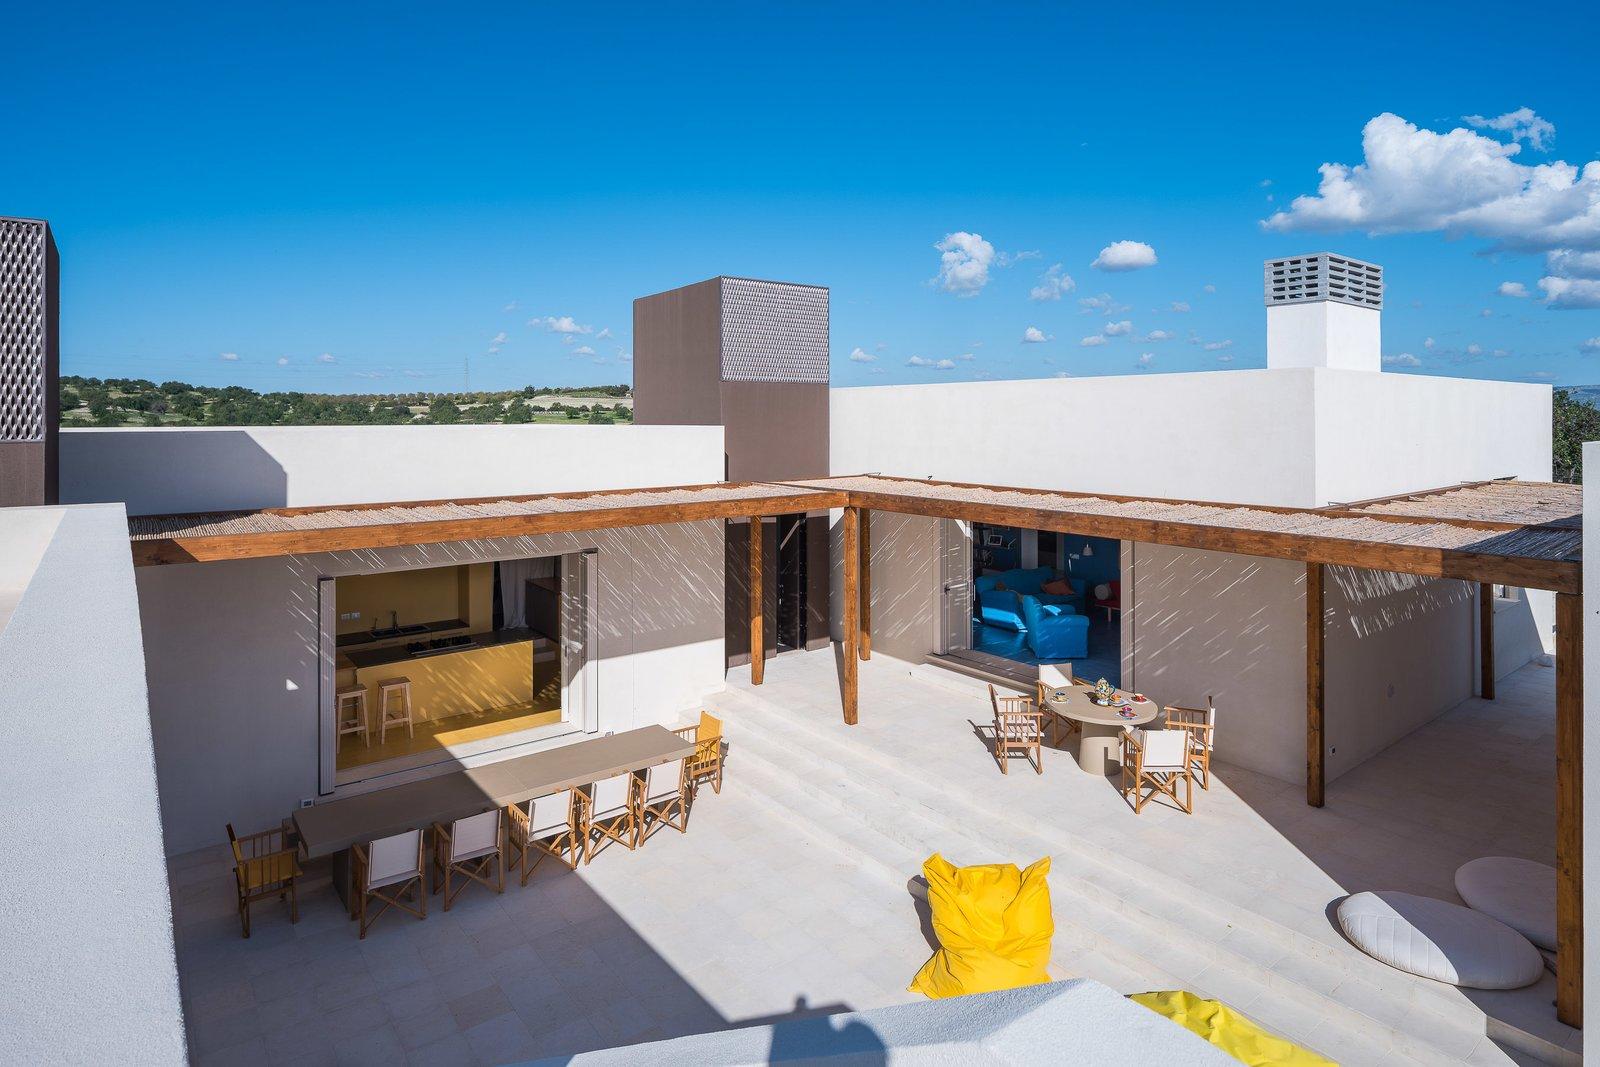 Outdoor, Large Patio, Porch, Deck, Stone Patio, Porch, Deck, and Front Yard  Cozzo Coniglio